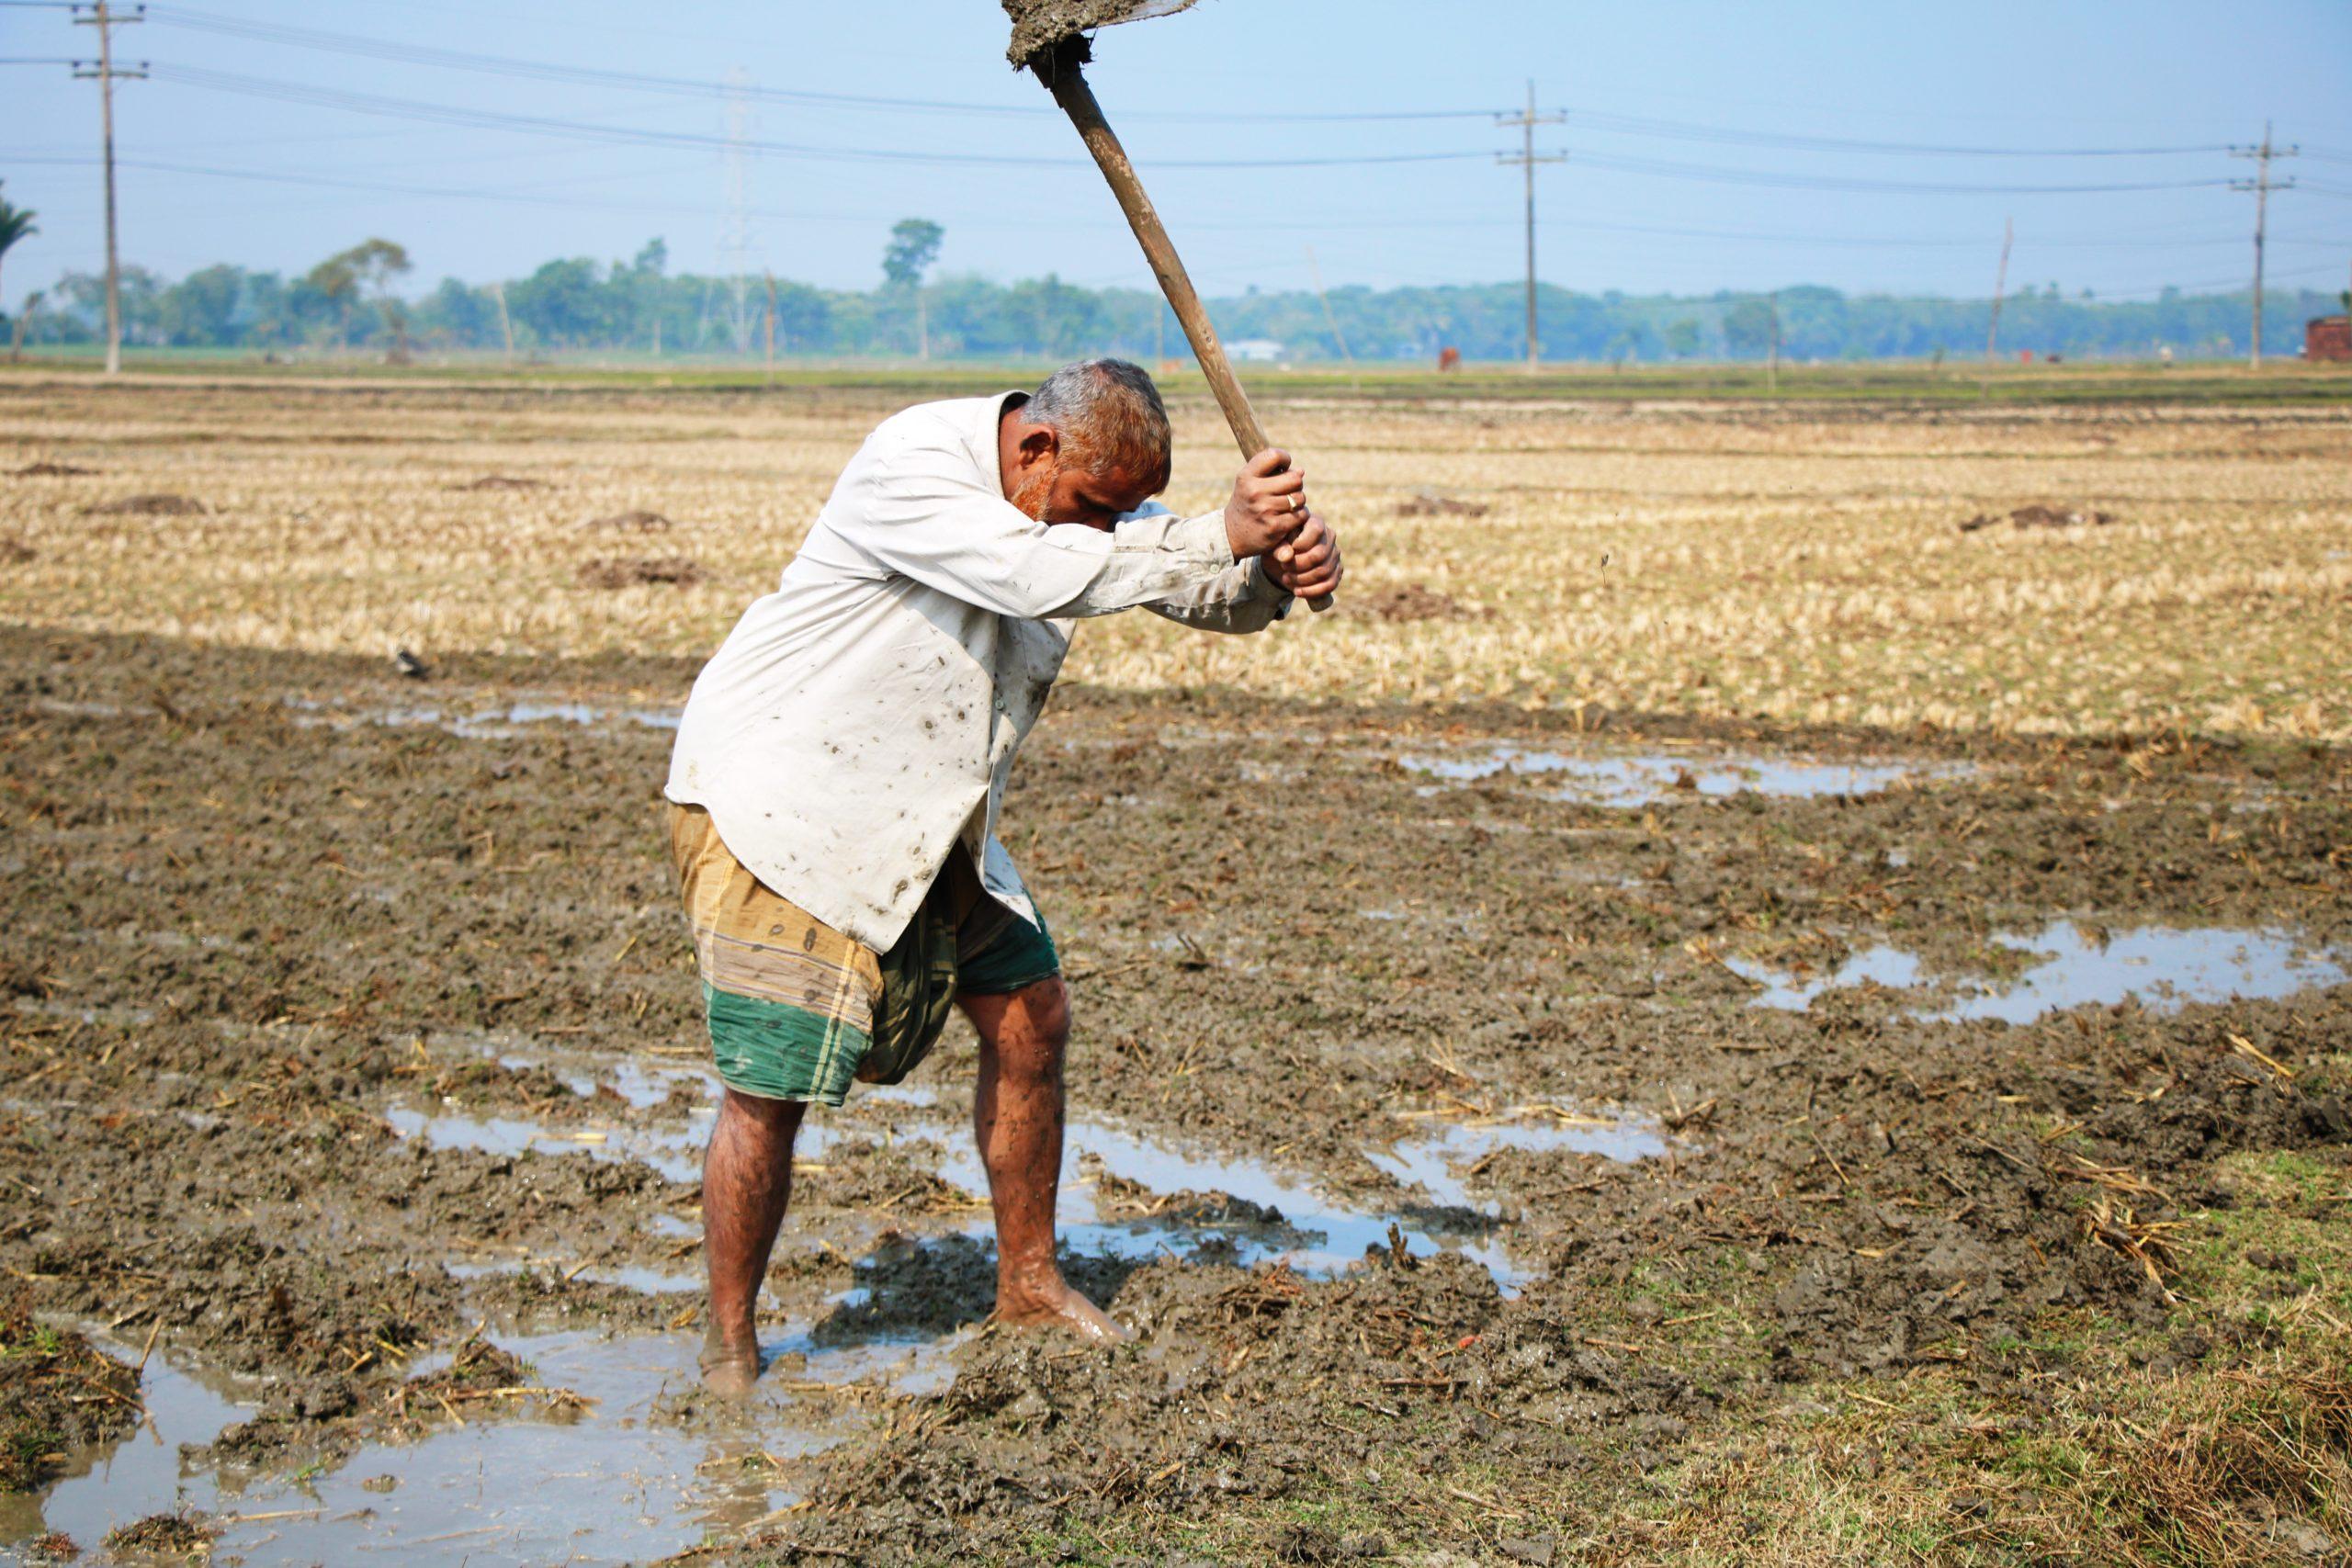 elderly man working with a hoe in muddy field